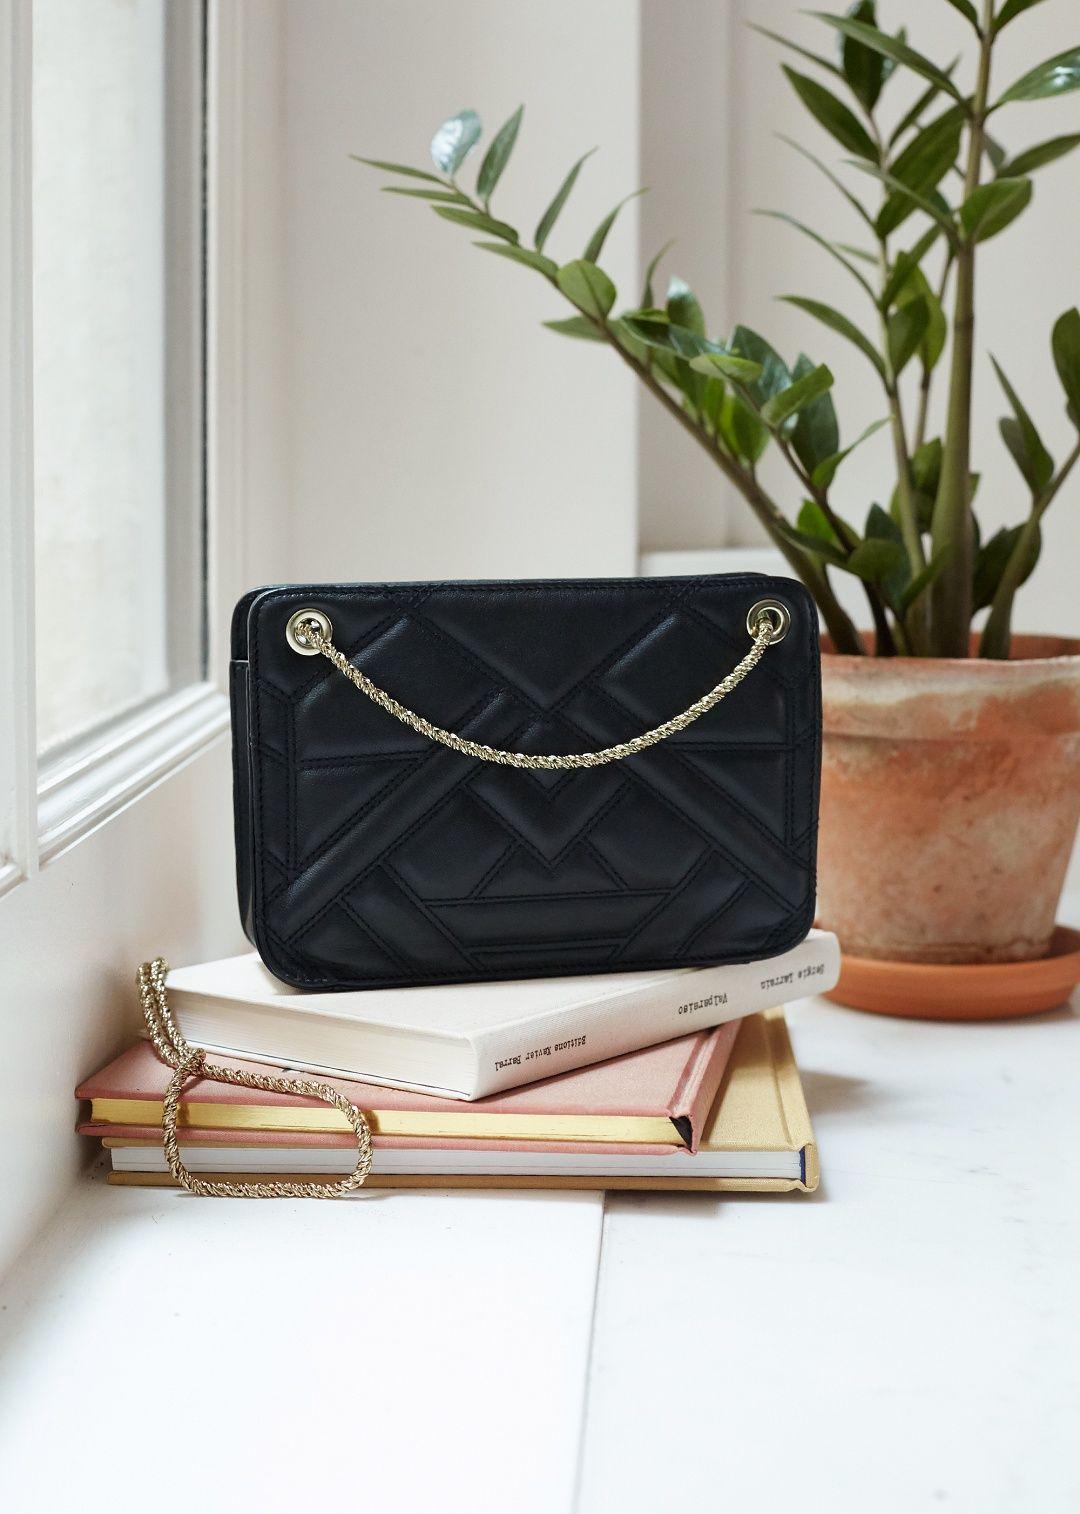 Sezane Mini Quilted Belli Bag Bags Bling Bags Mini